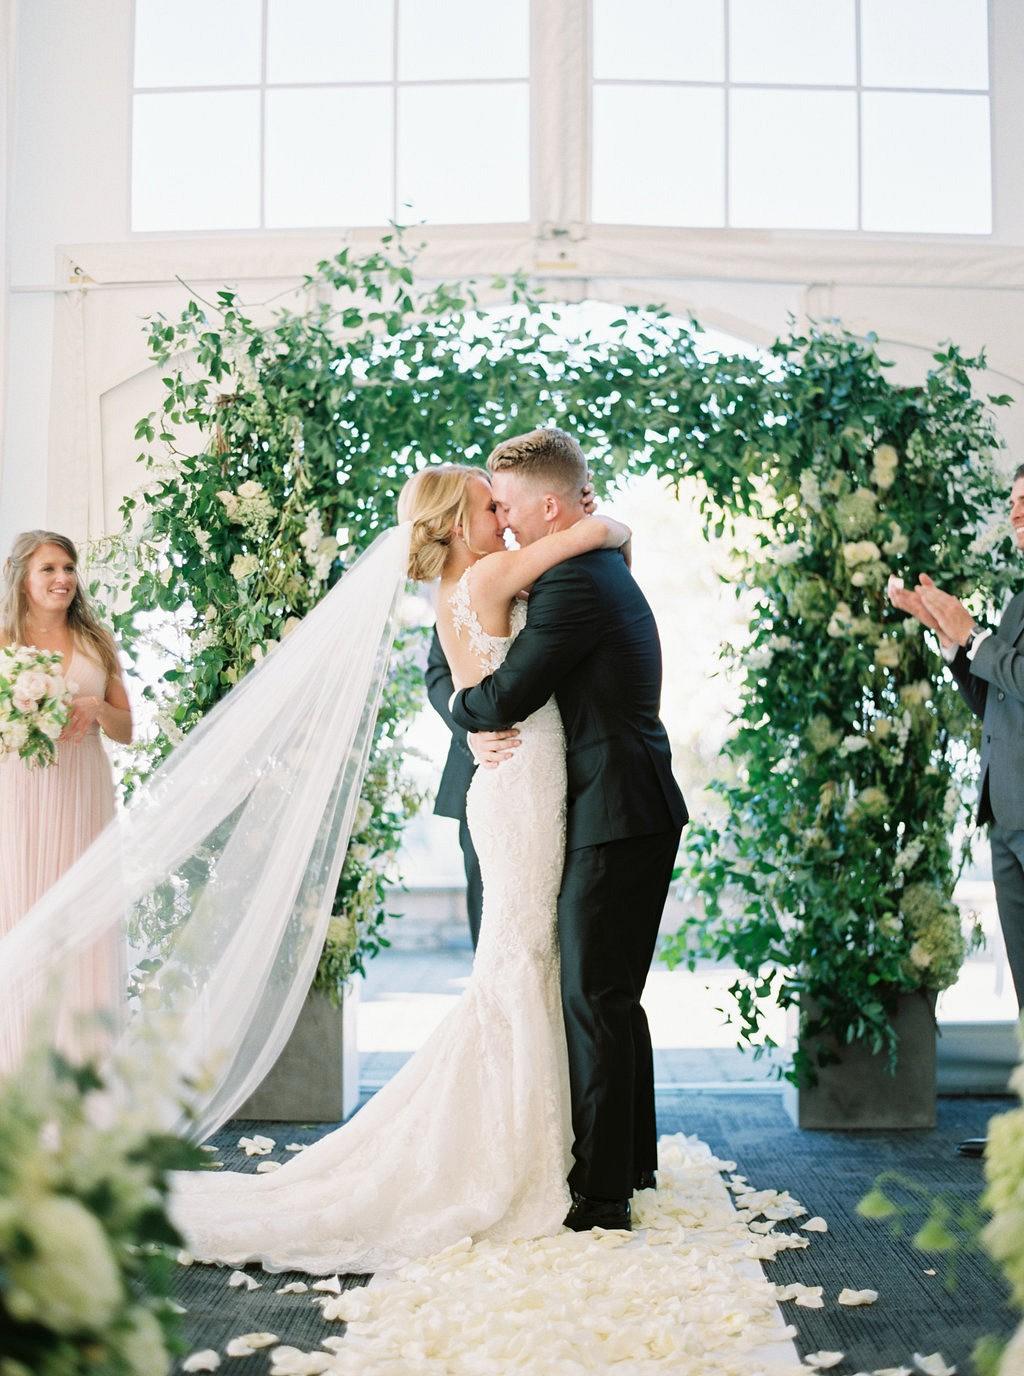 Melanie and Tyson's Supremely Elegant Blue and Blush Wedding